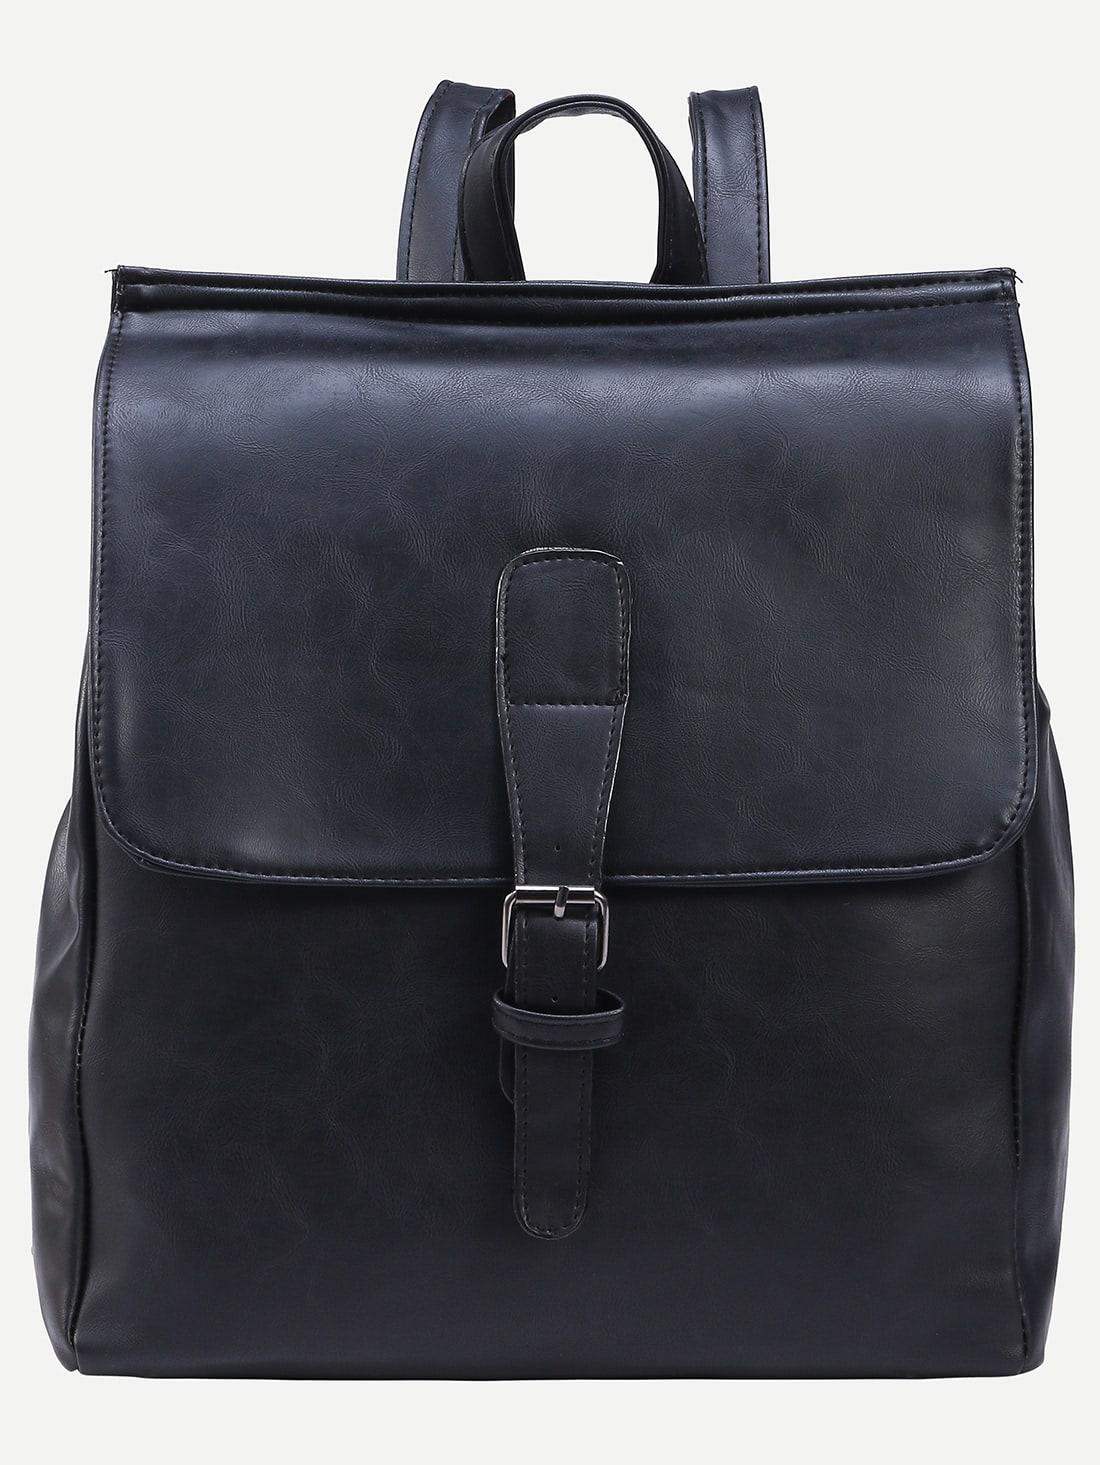 Фото Black Buckled Strap Front Flap Backpack. Купить с доставкой